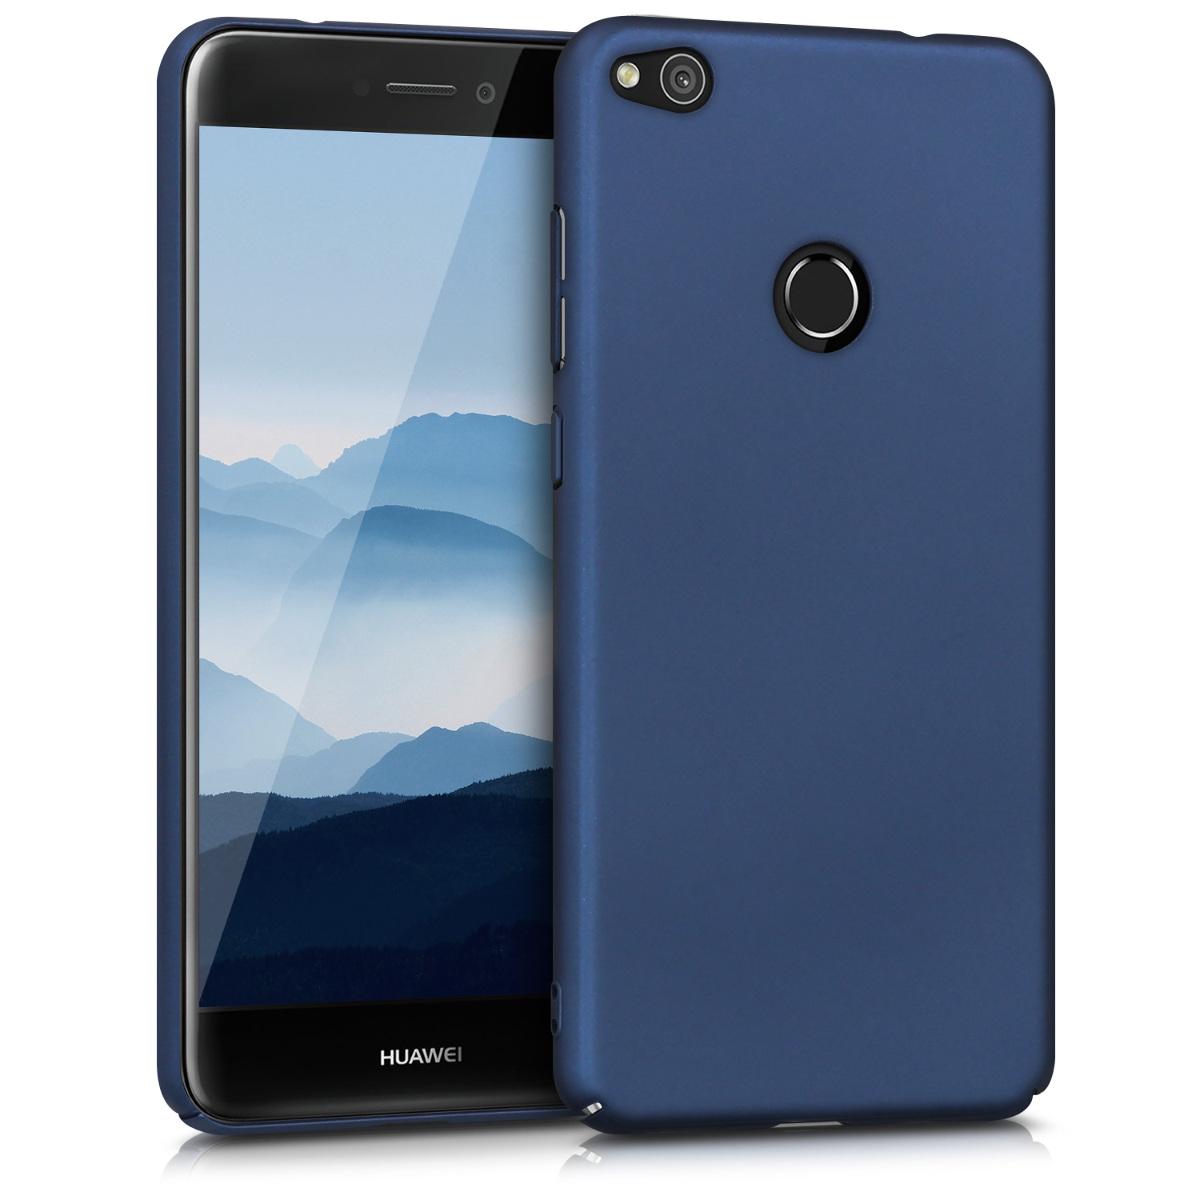 KW Slim Anti-Slip Cover - Σκληρή Θήκη Καουτσούκ Huawei P8 / P9 Lite (2017) - Σκούρο μπλε (43236.53)